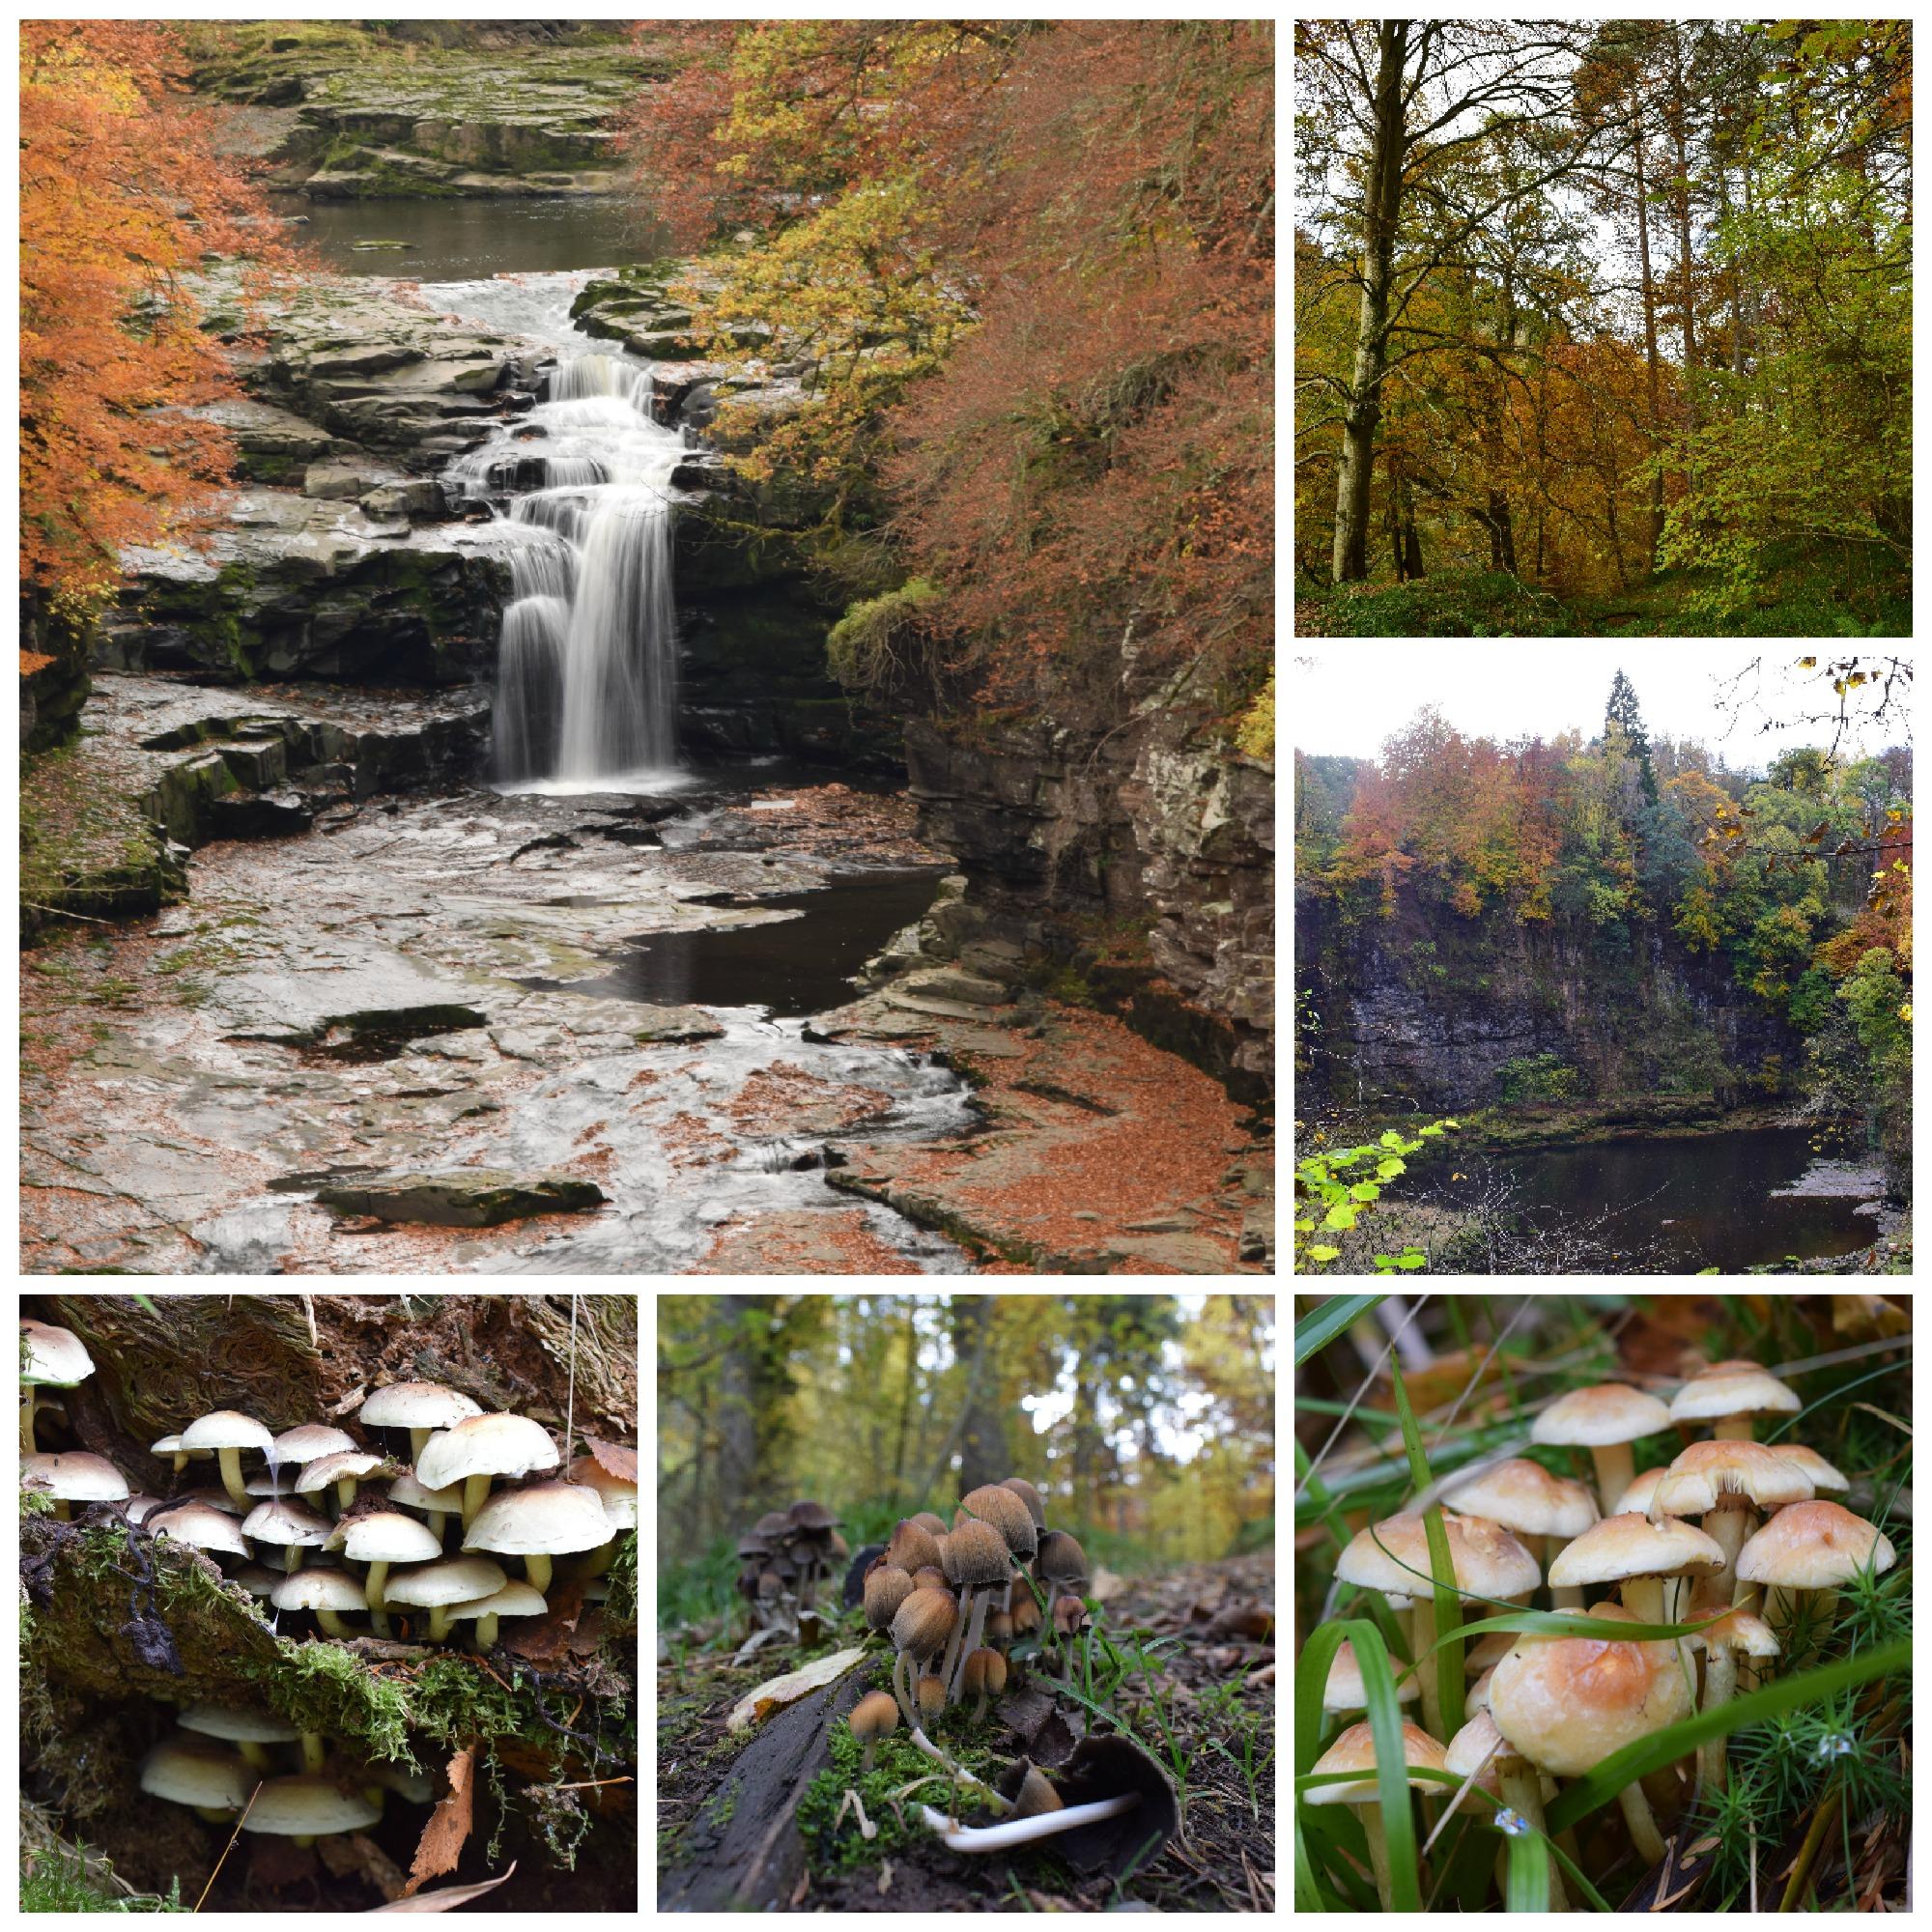 Waterfalls, trees and fabulous fungi (C) Tom McIntosh